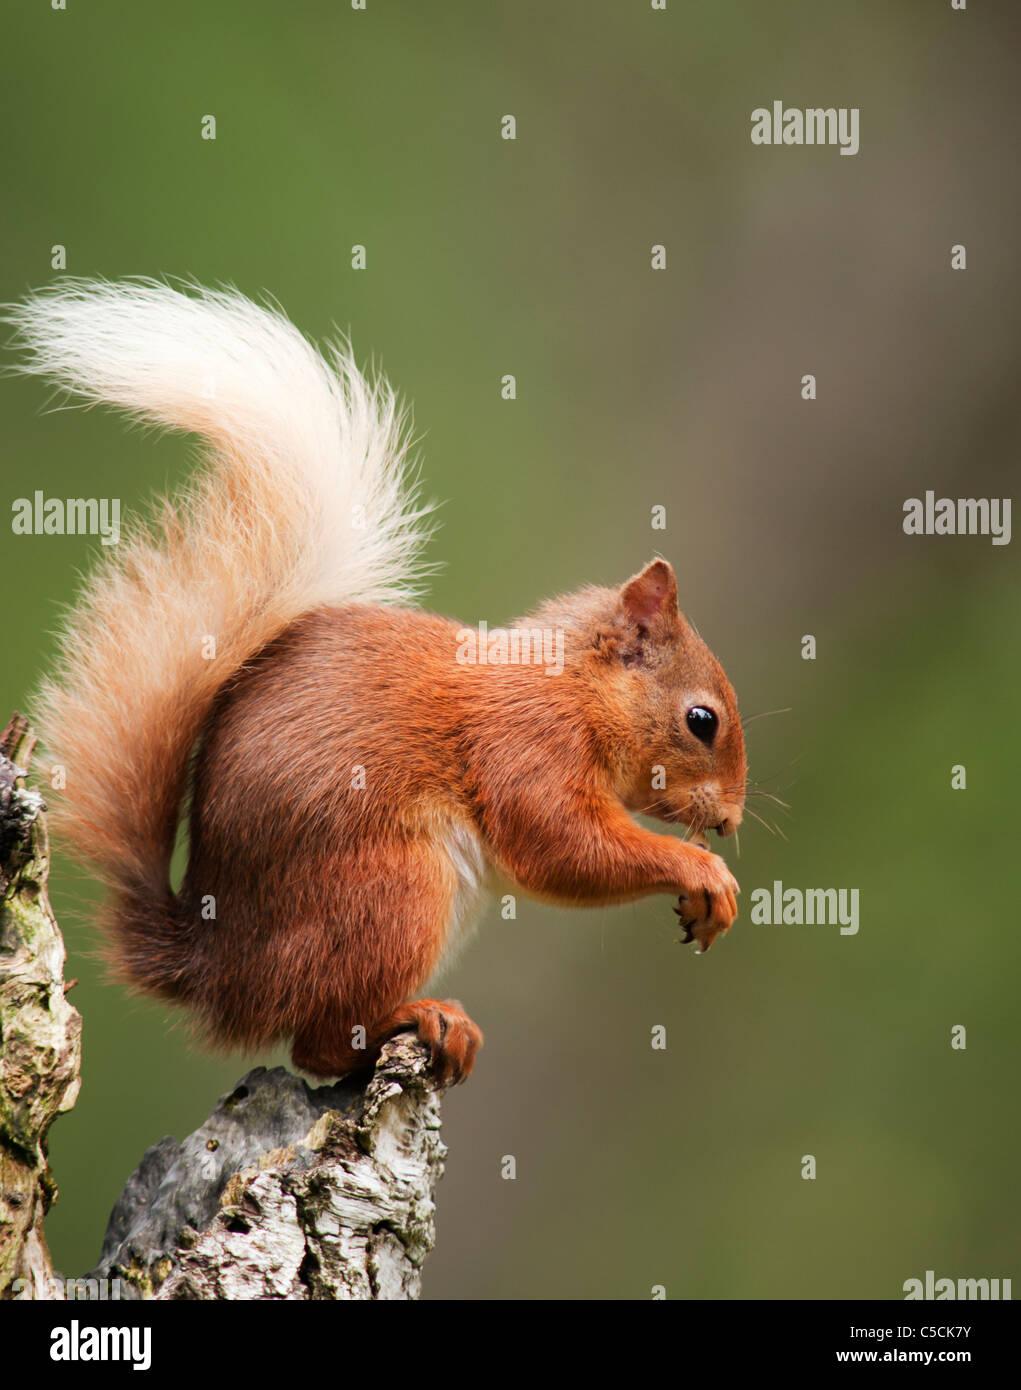 Red Squirrel Sciurus vulgaris feeding on tree stump in woodland,  Strathspey, Scotland Stock Photo